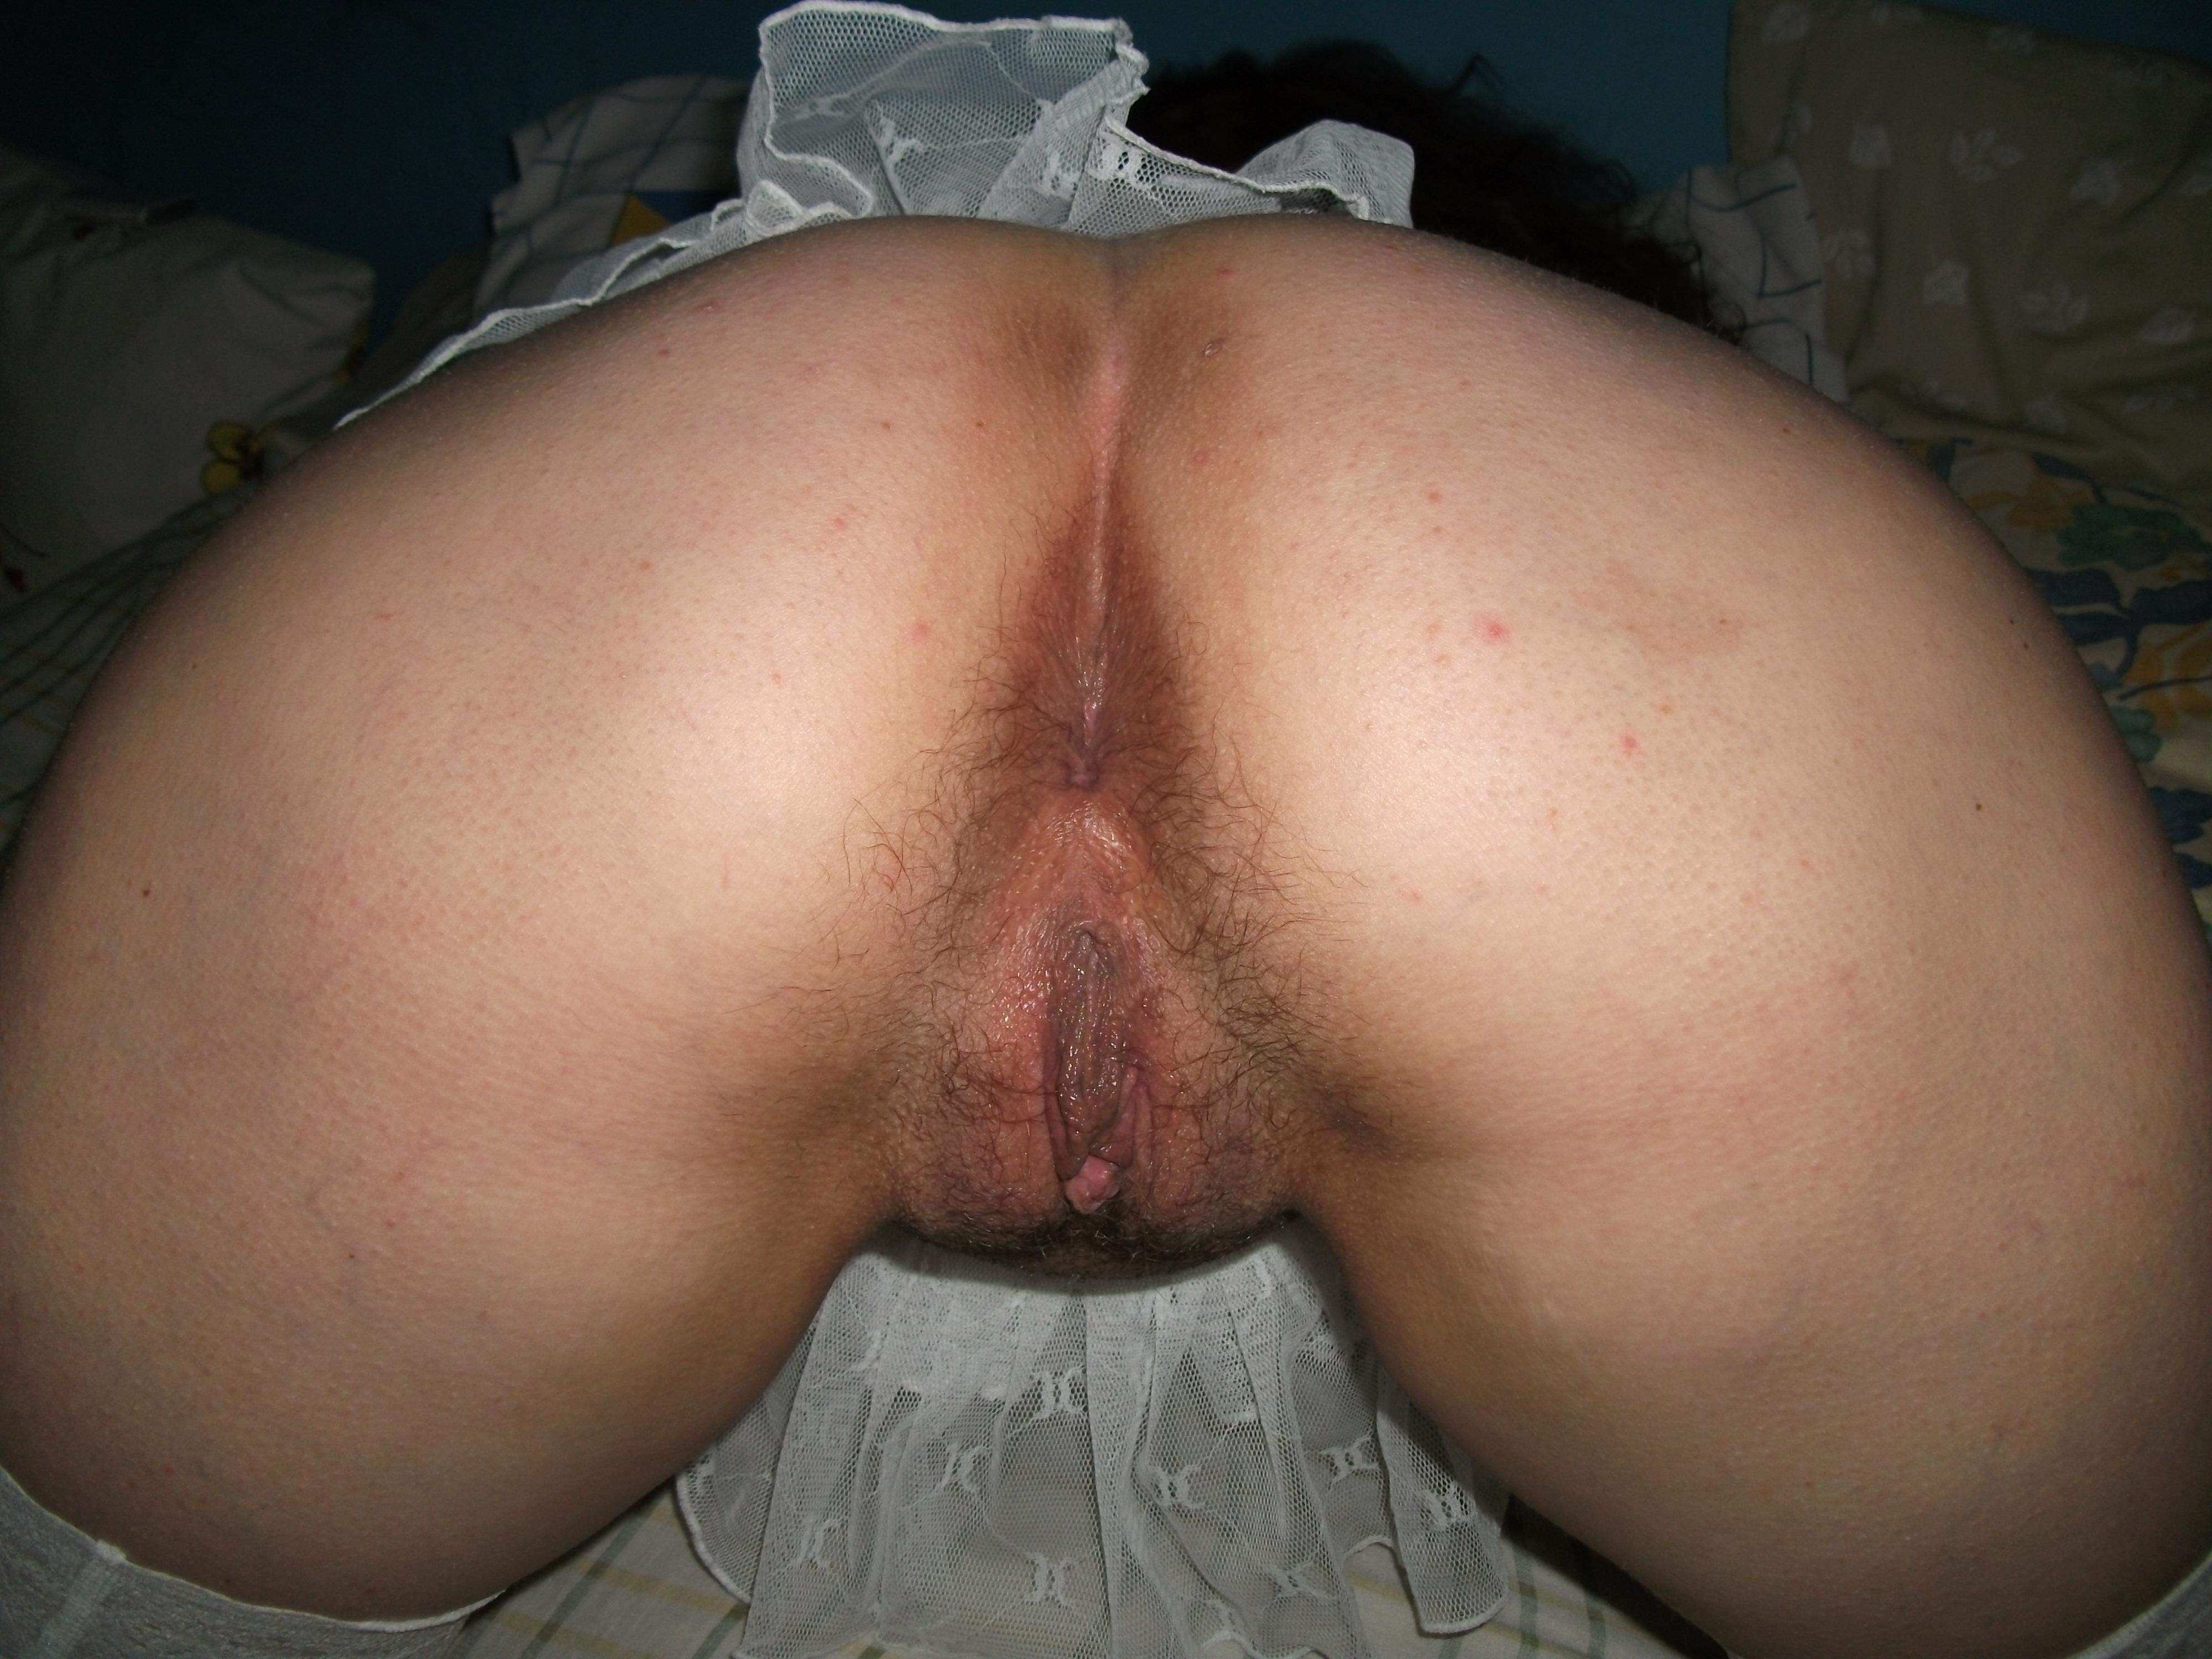 culazo Latina On Yuvutu Homemade Amateur Porn Movies And XXX Sex. culazo